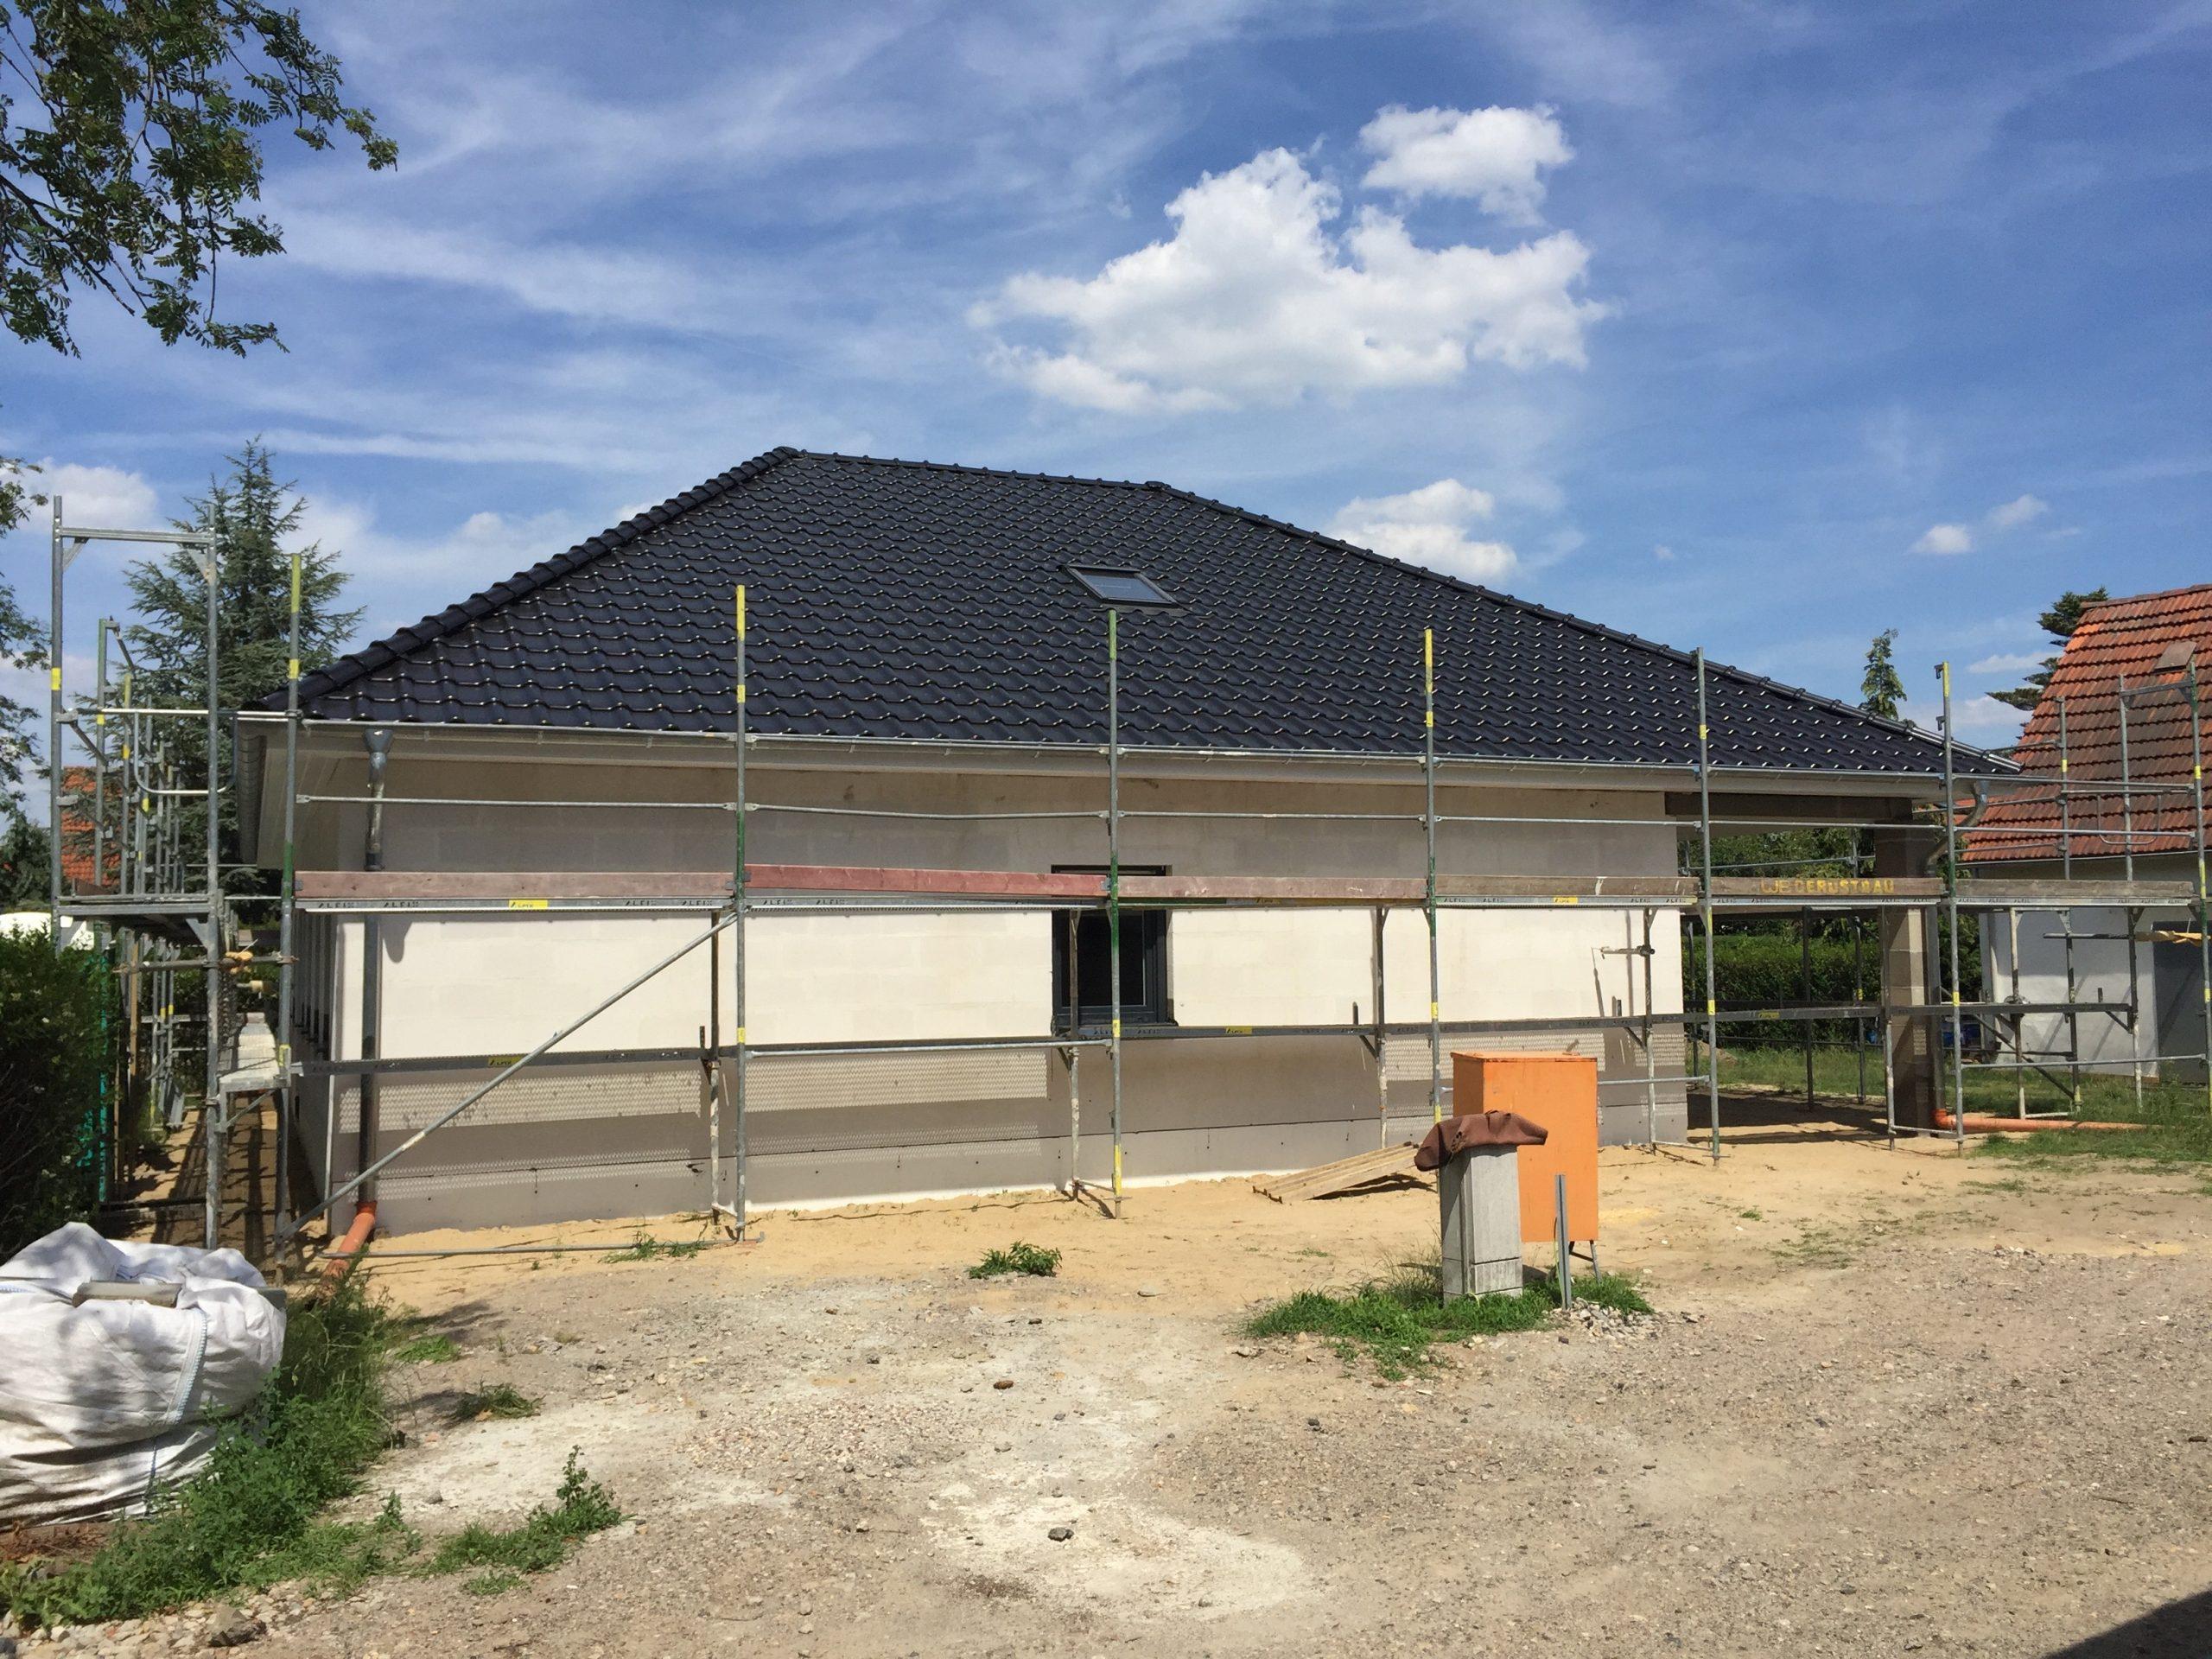 Bungalow in Hennigsdorf